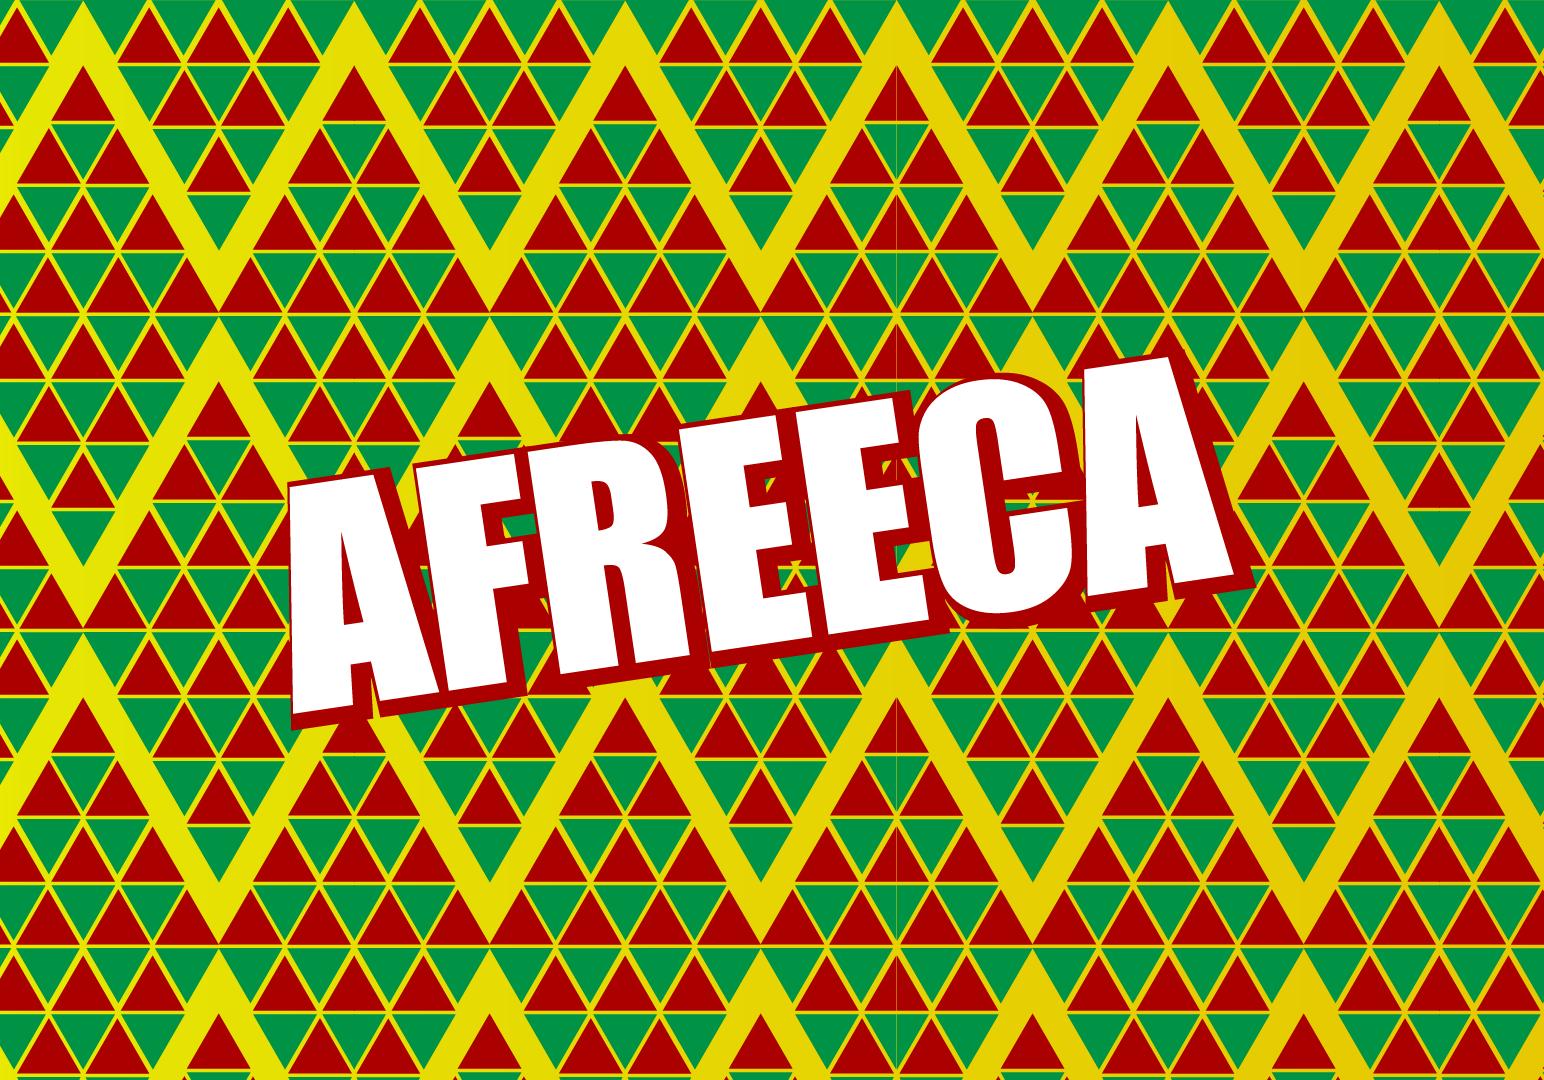 Grafica Afreeca_Tavola disegno 1